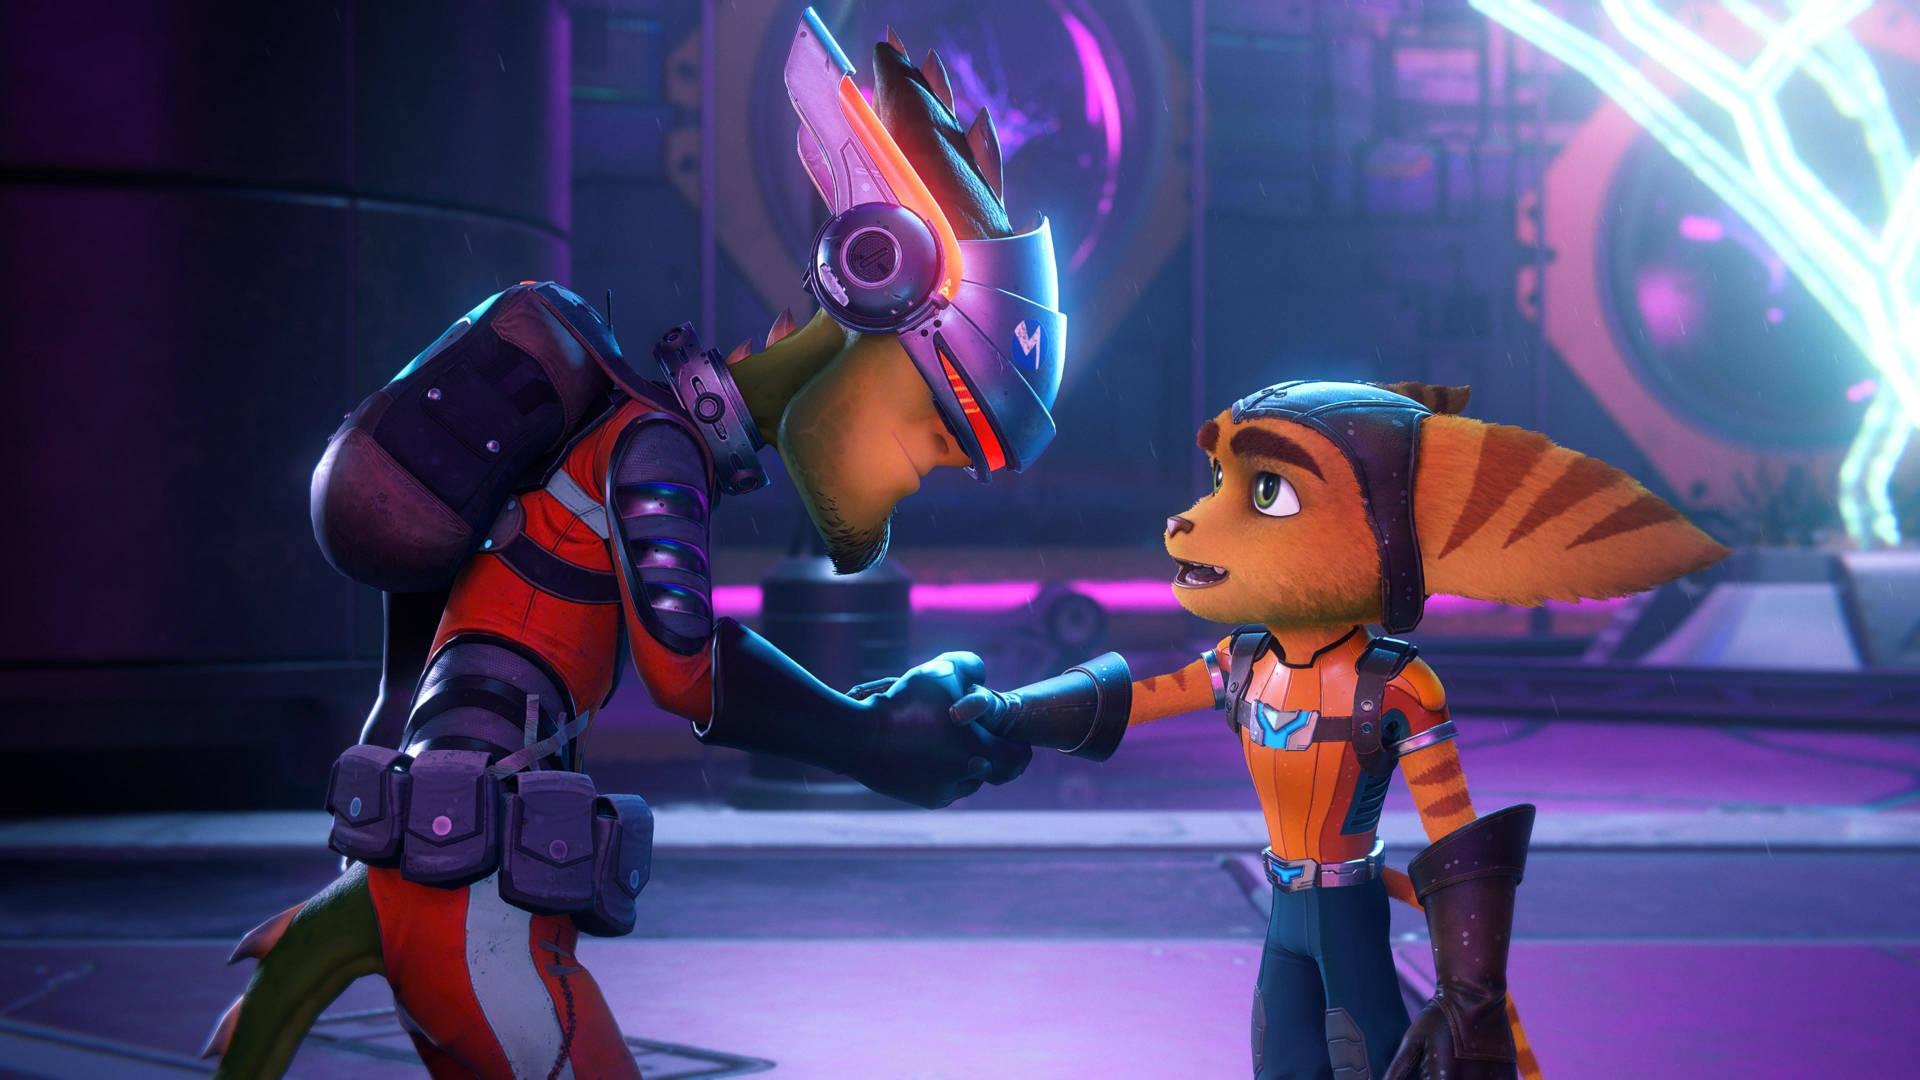 Скриншоты Ratchet & Clank: Rift Apart